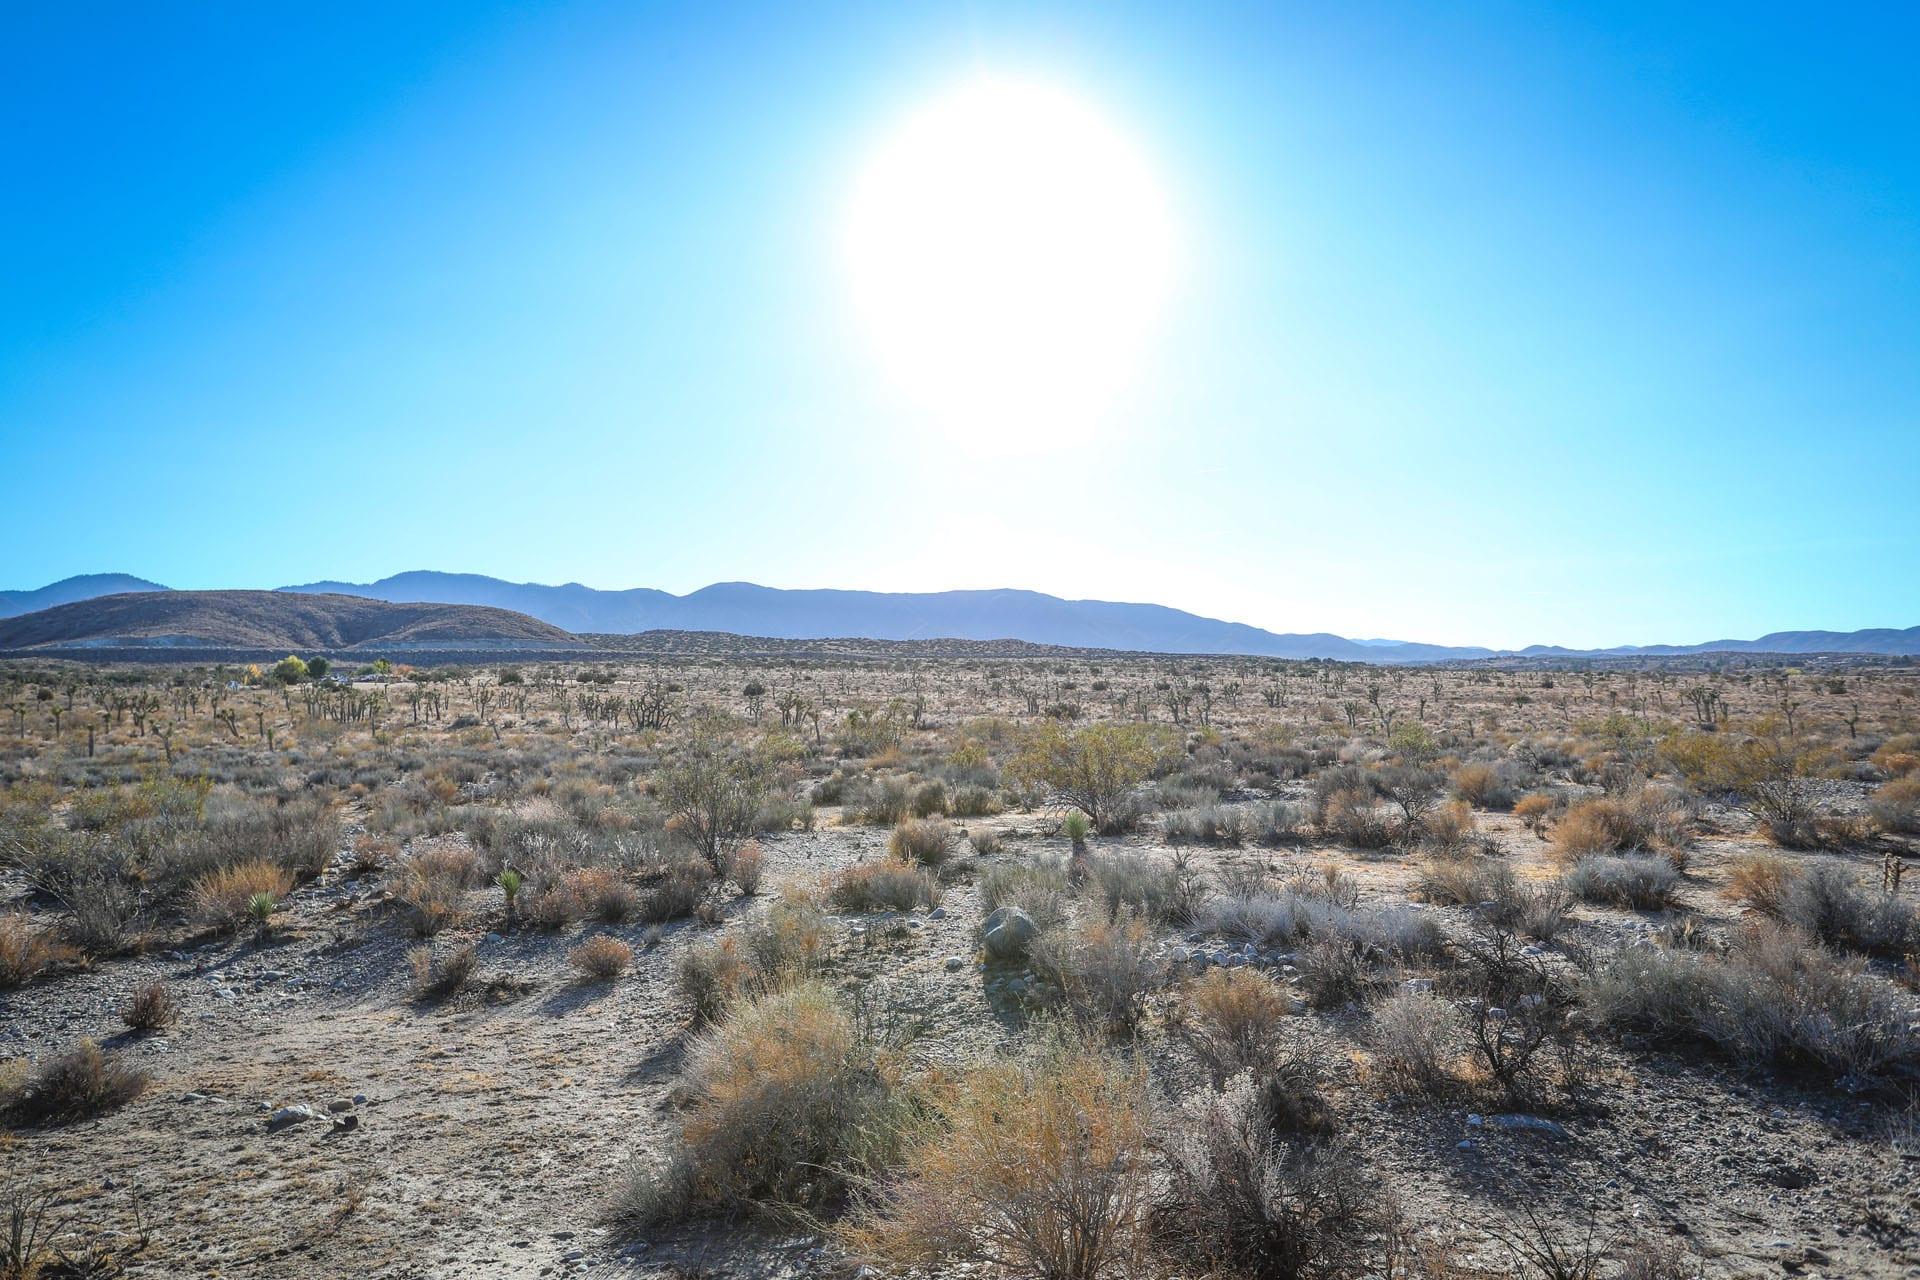 Desert field, bright sun